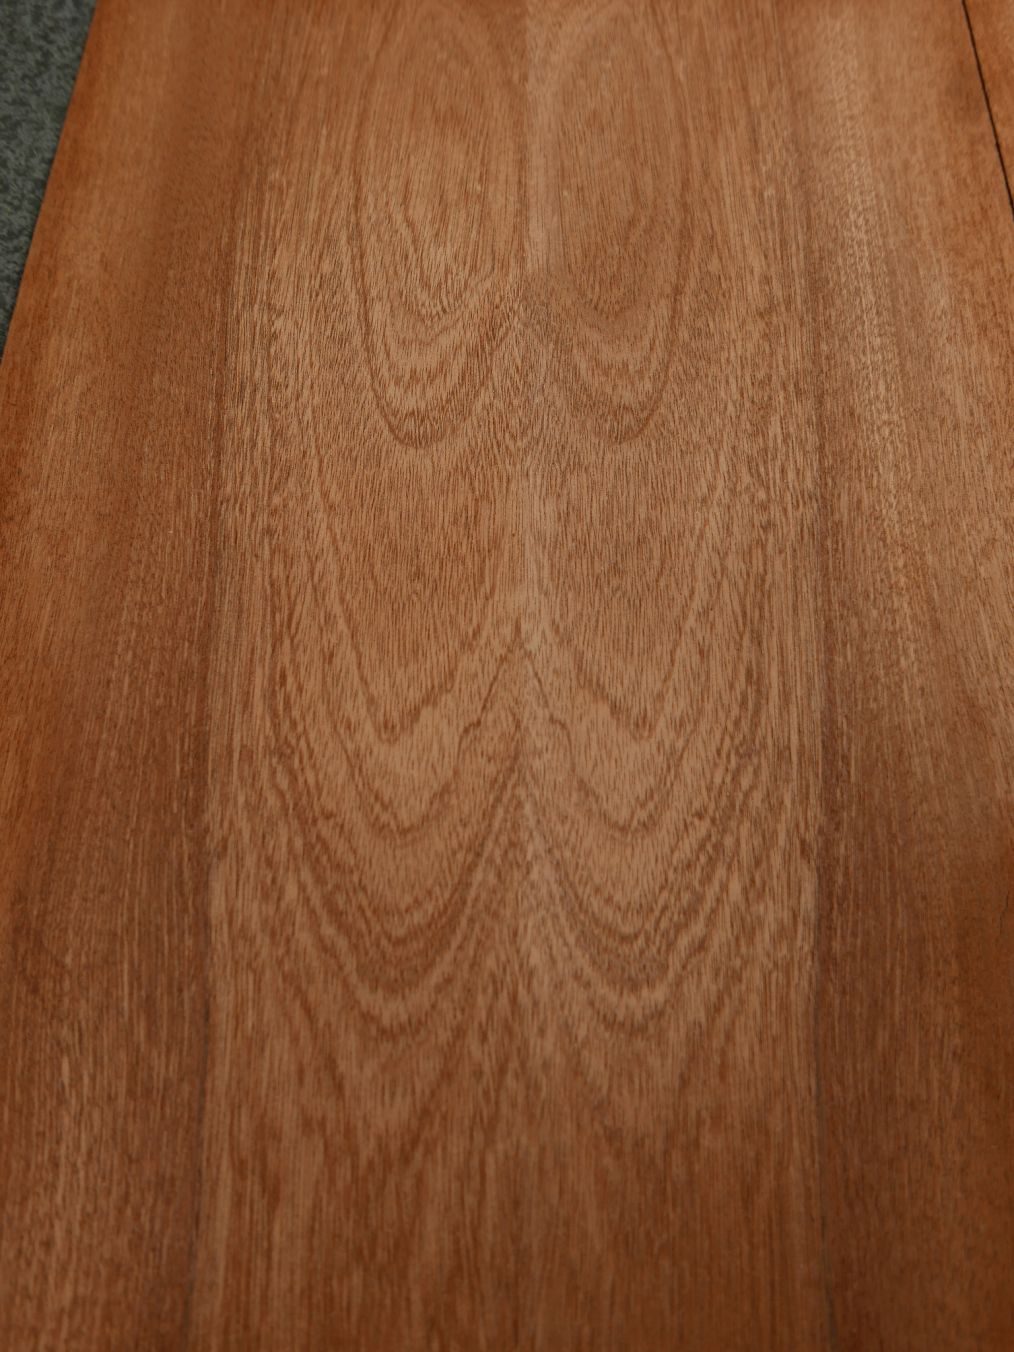 G1239-3 Gevoegd Mahonie 30x43cm 4st